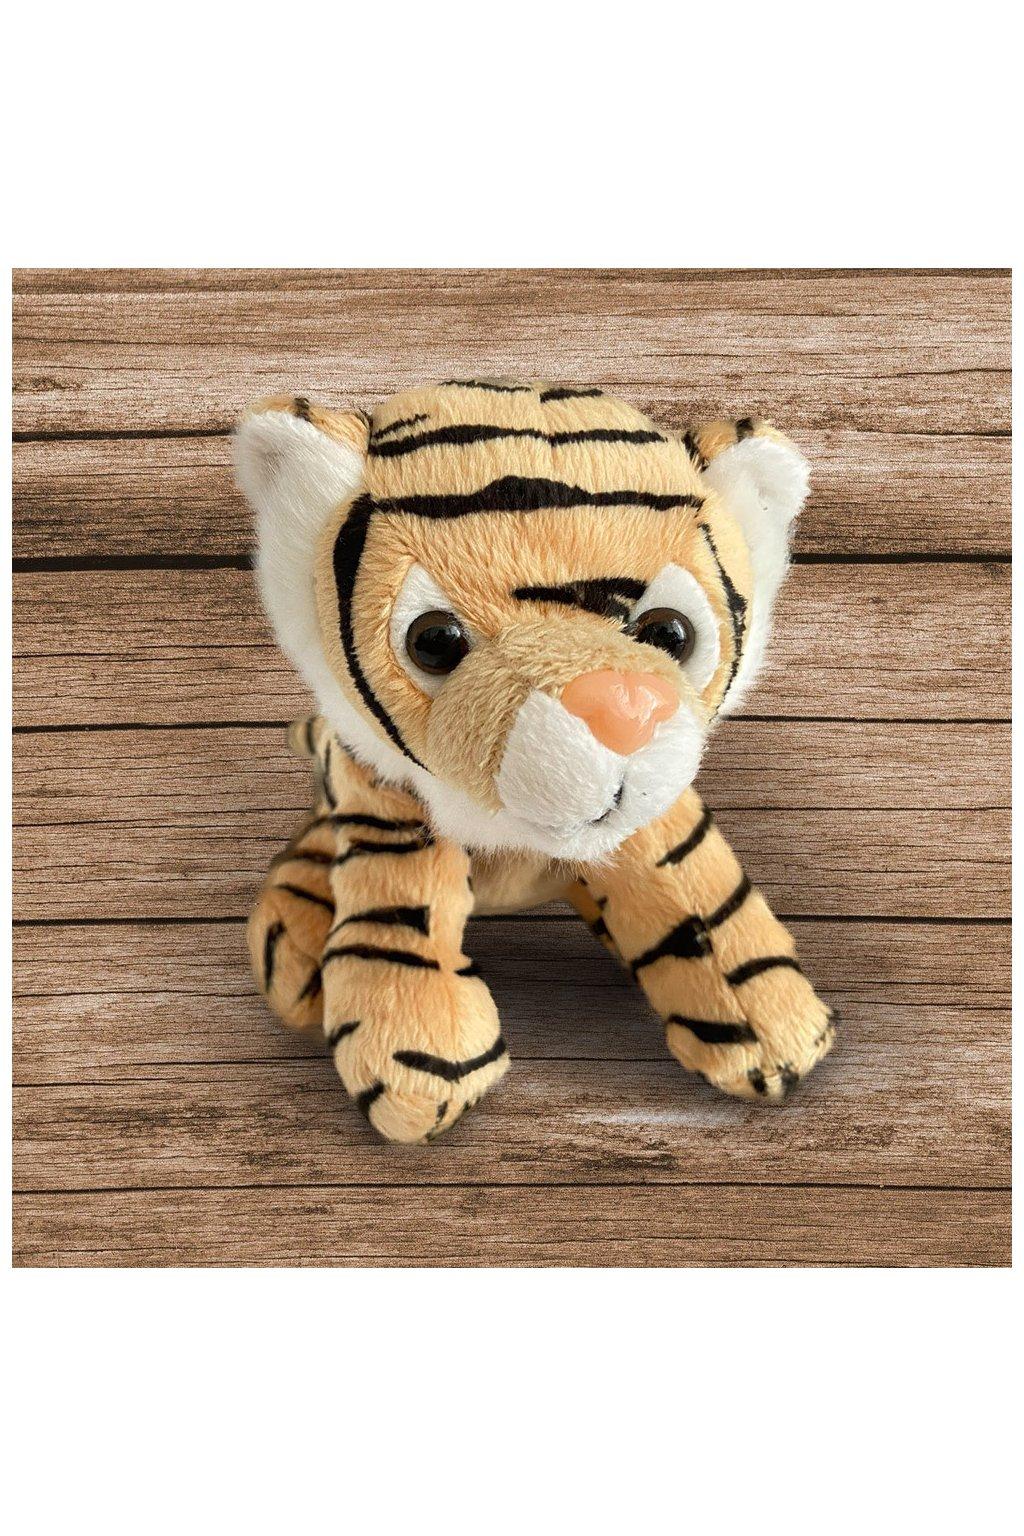 plysaci shoptet eshop tygr